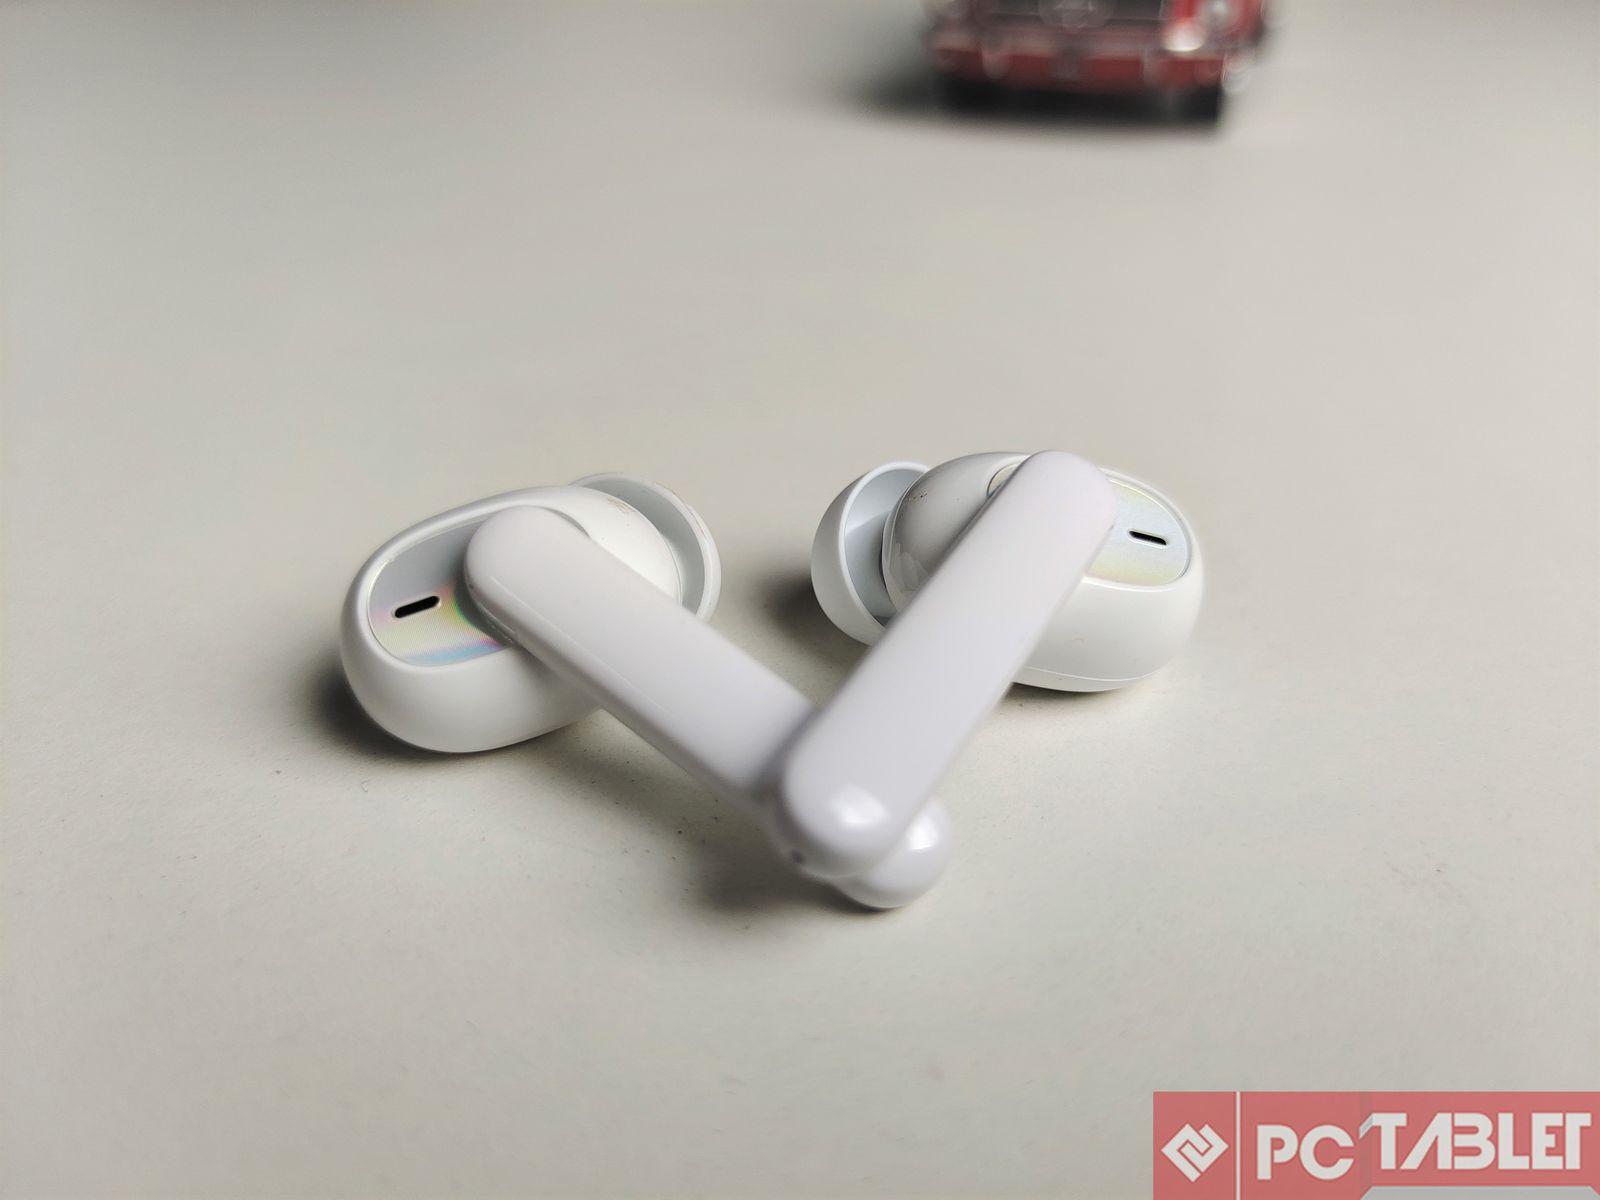 Oppo Enco W51 Truly Wireless Earbuds Review 7